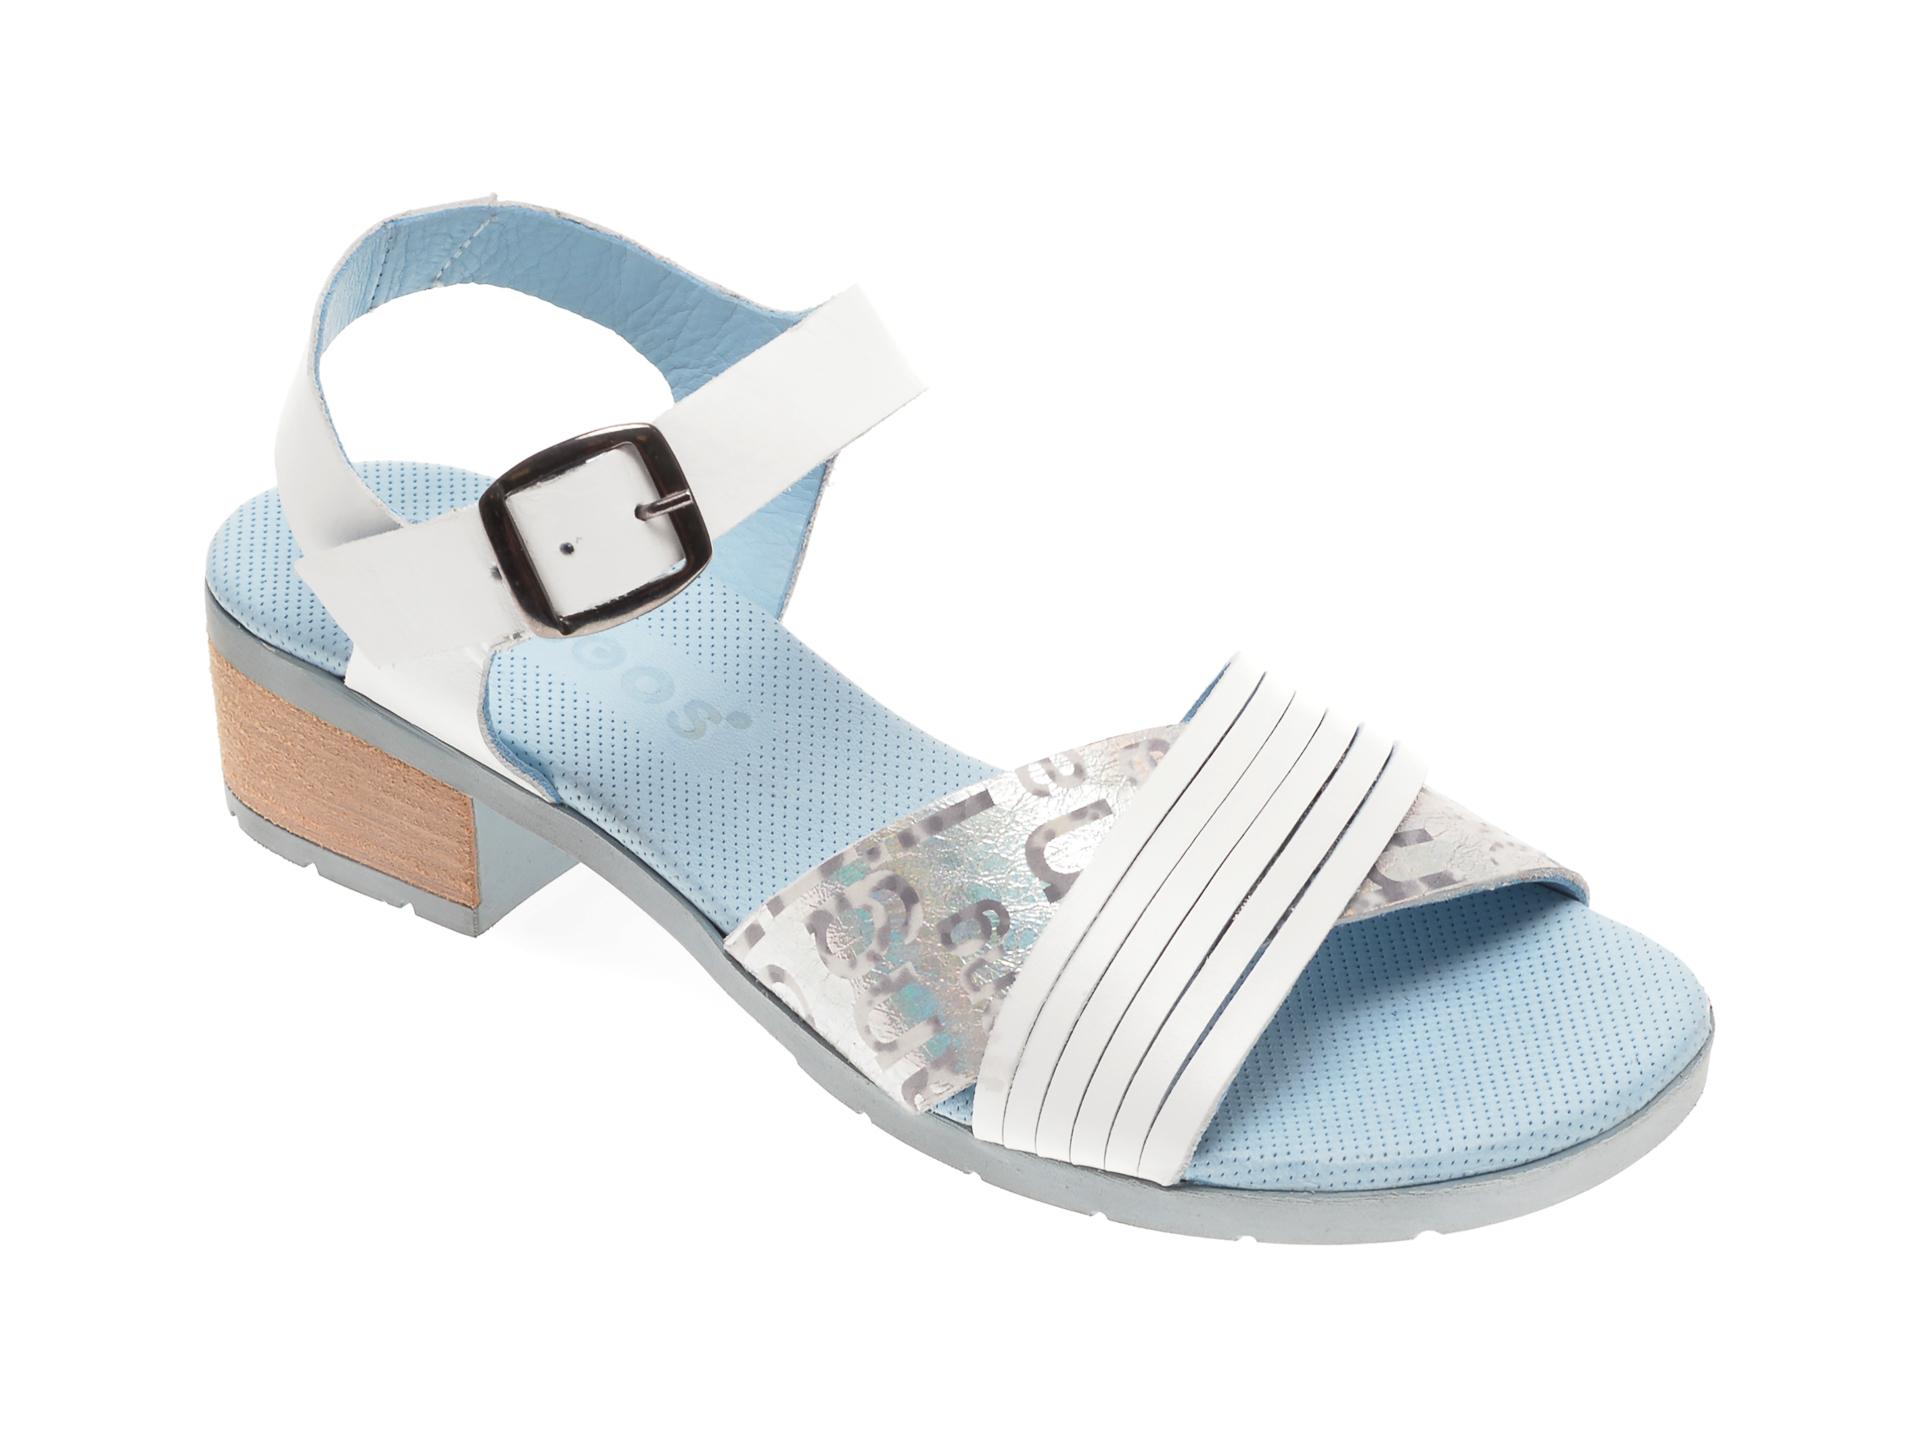 Sandale BABOOS albe, 1507, din piele naturala